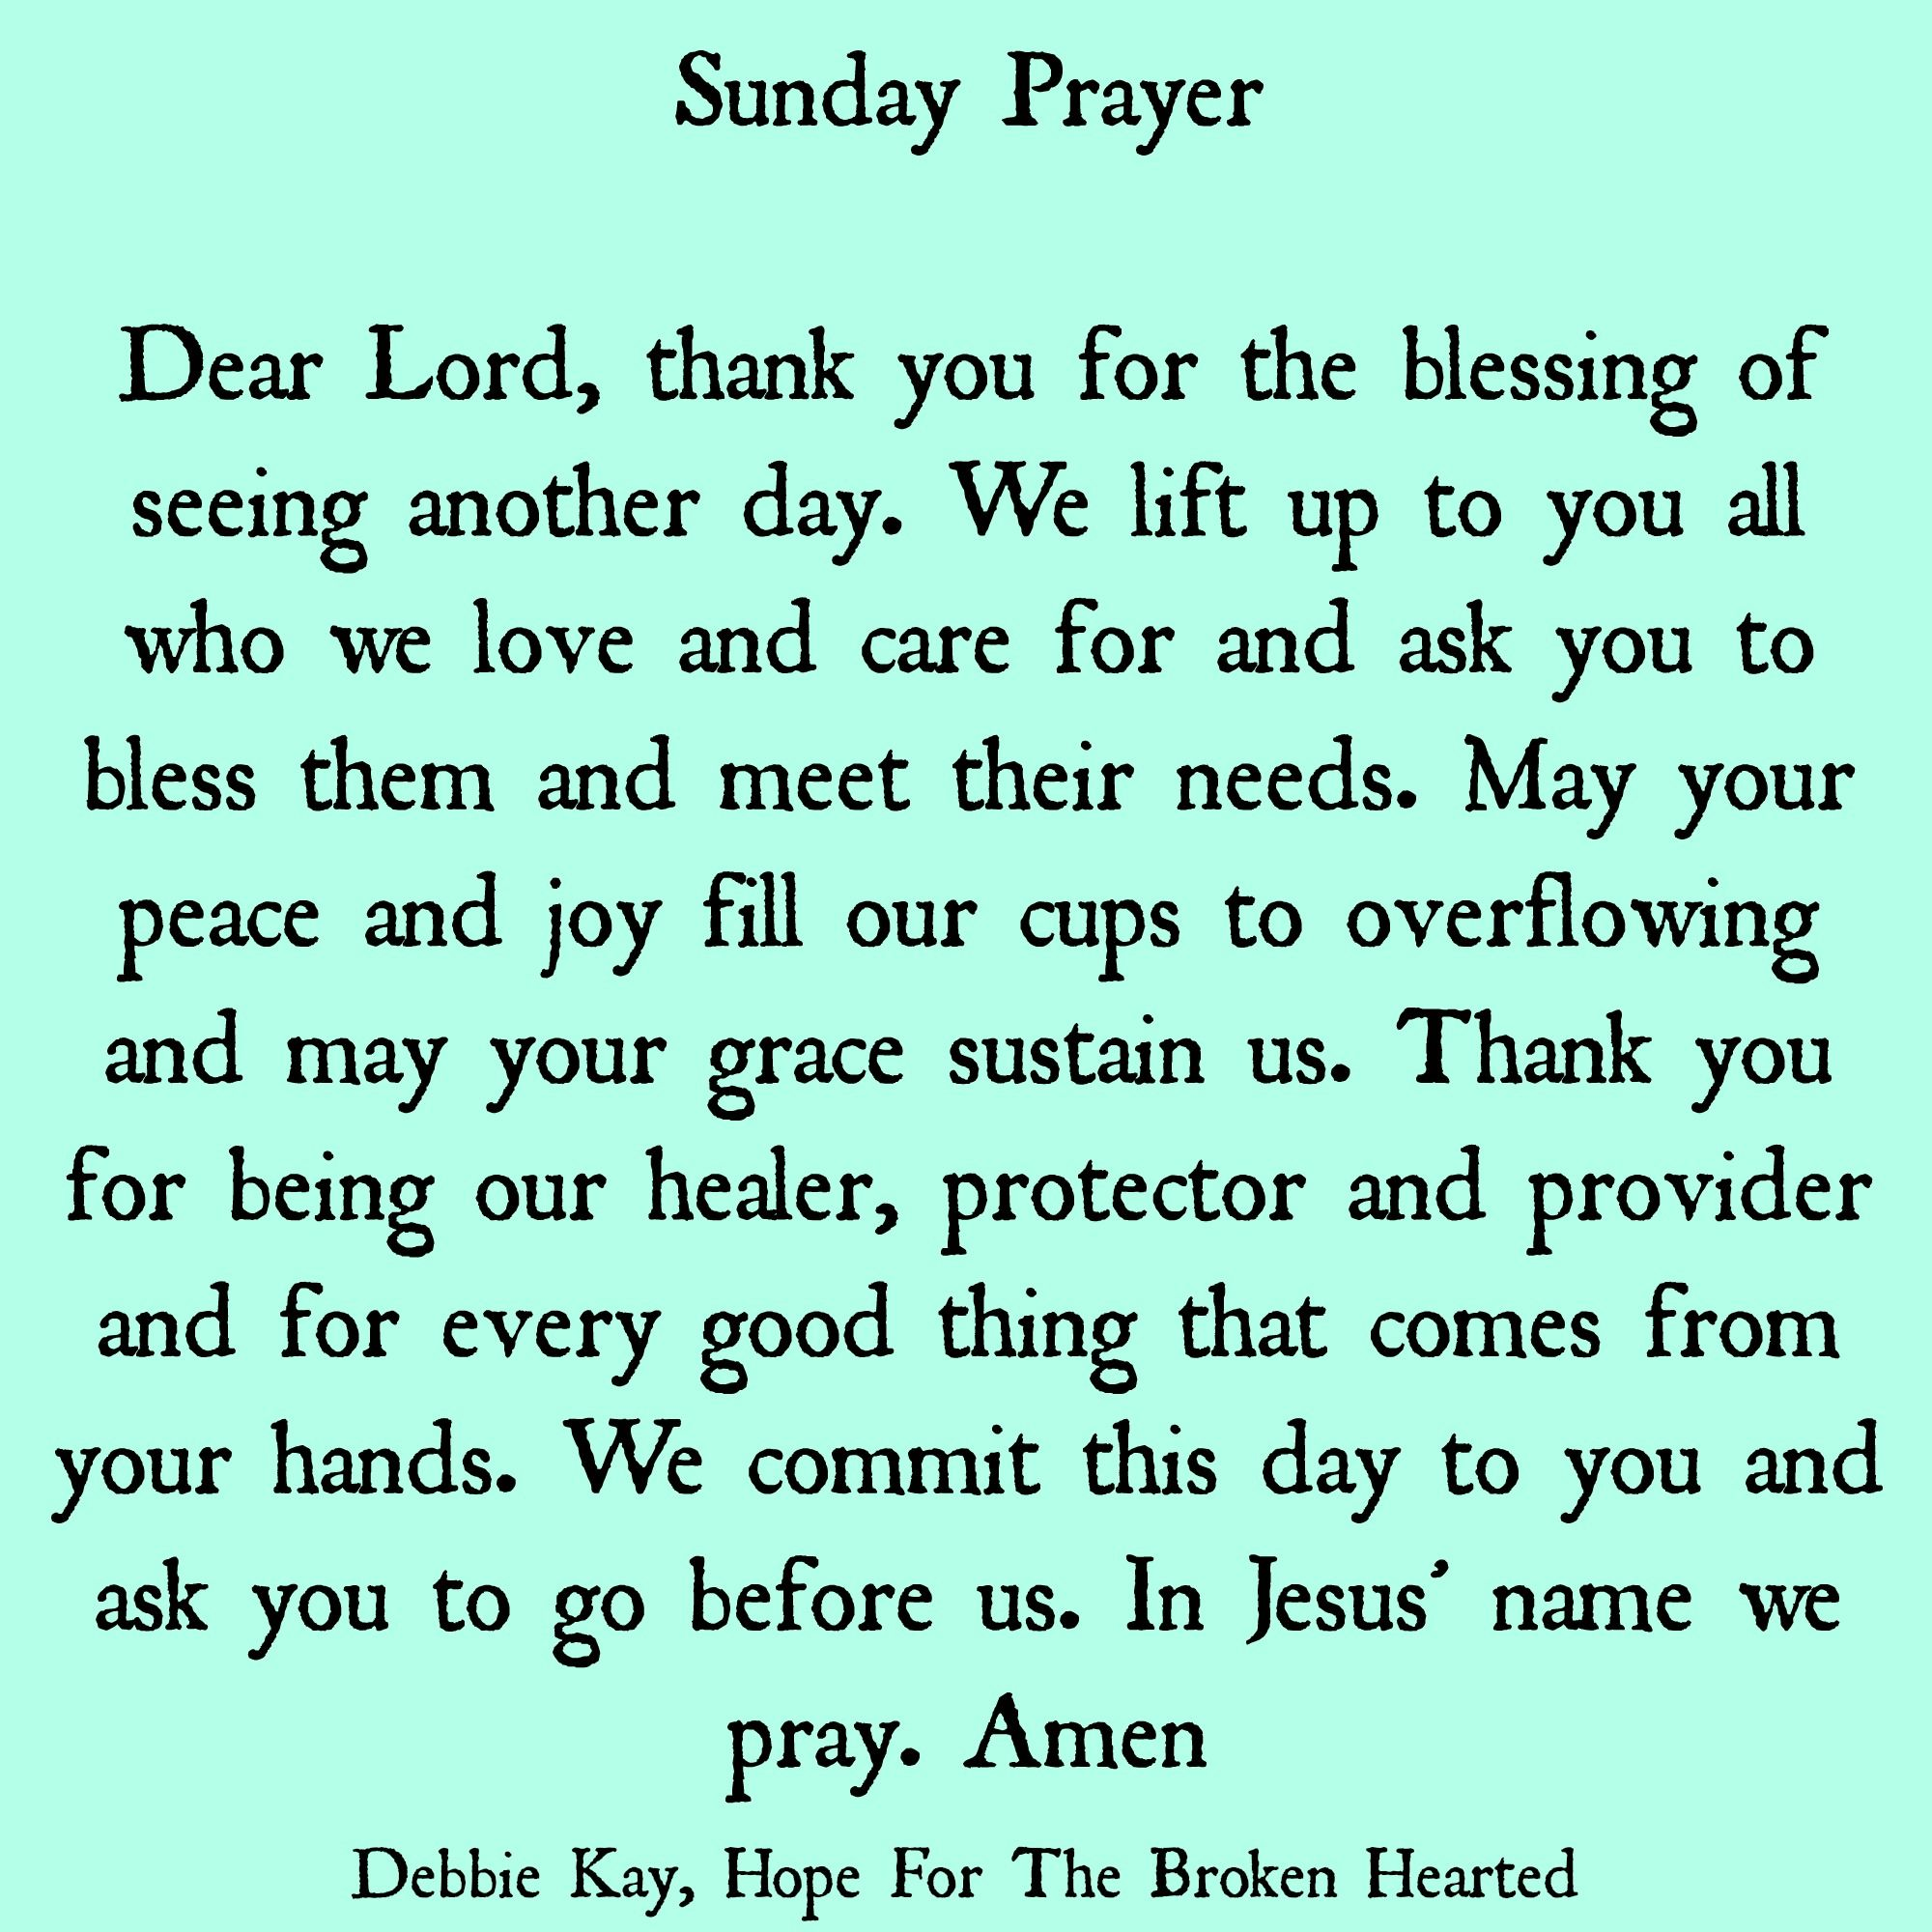 Sunday prayer | Sunday prayer, Sunday morning prayer, Morning prayers